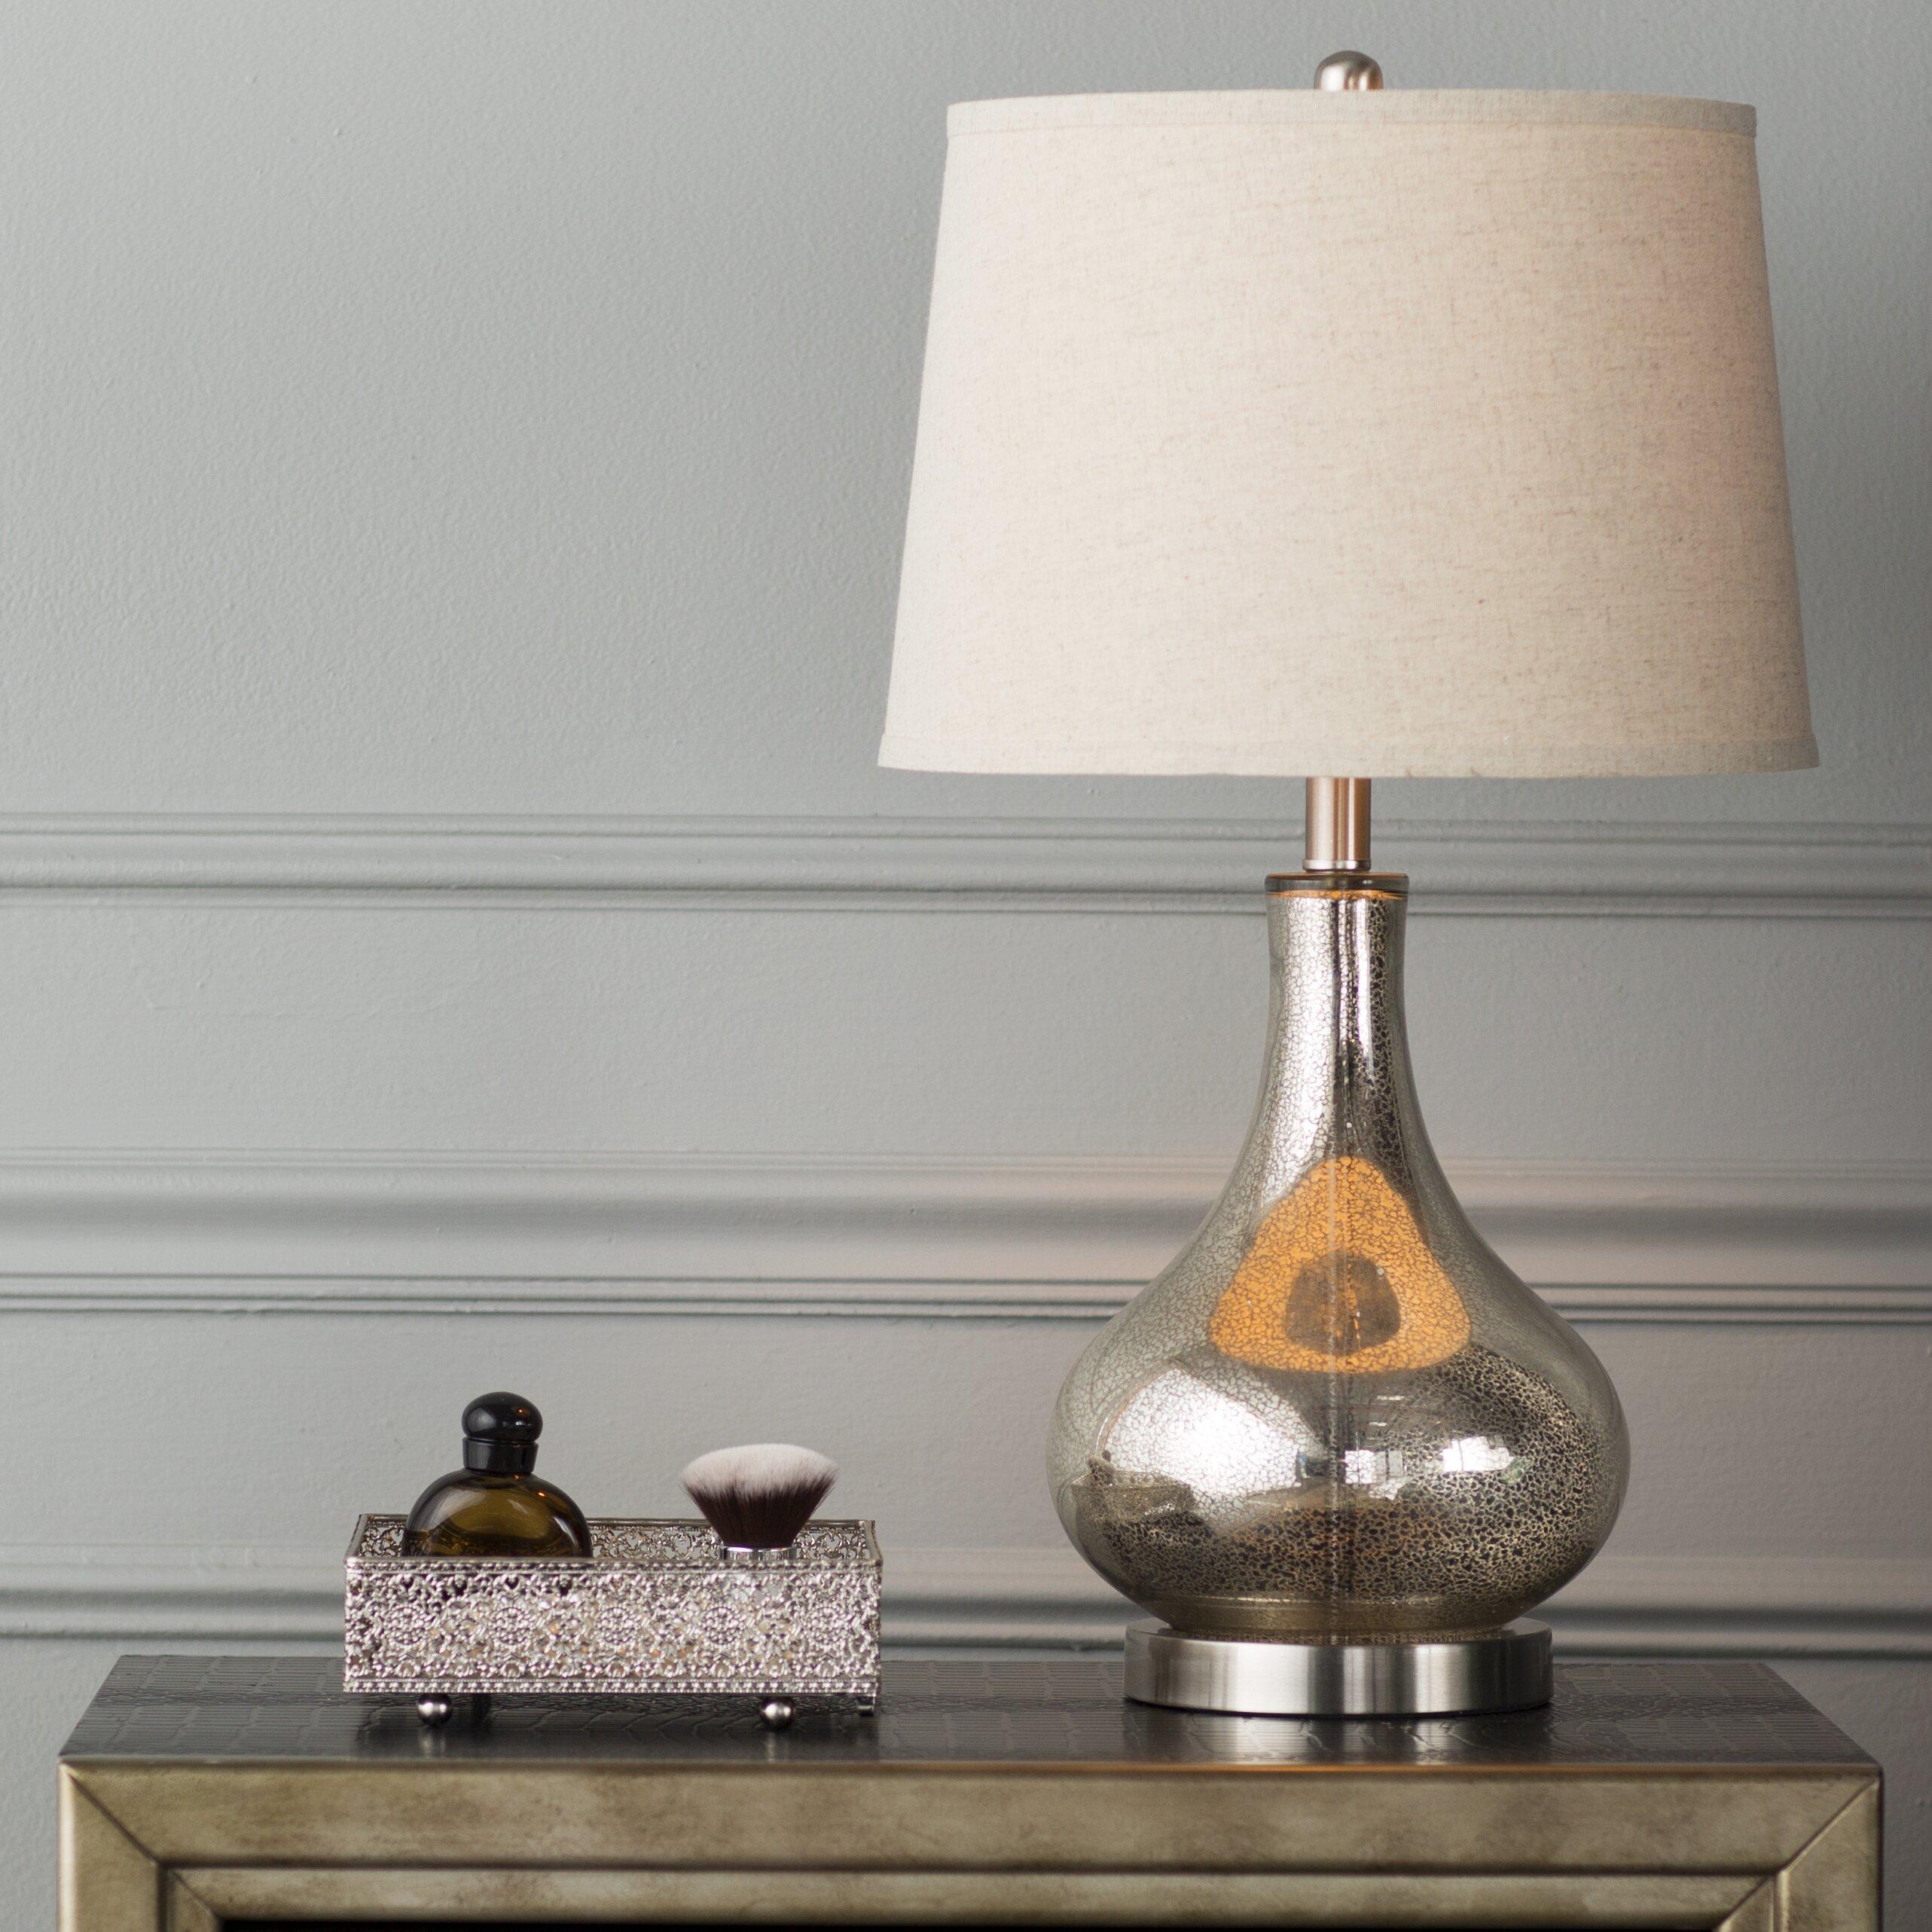 mercer41 stark 24 table lamp reviews wayfair. Black Bedroom Furniture Sets. Home Design Ideas